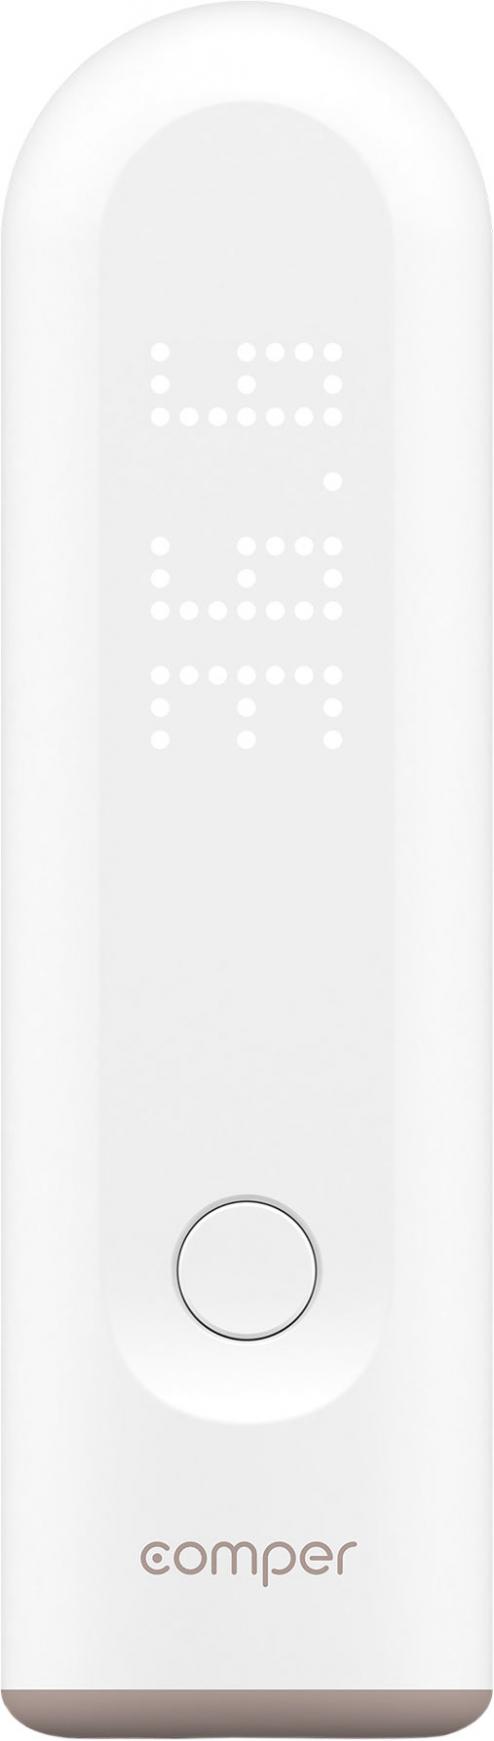 Инфракрасный термометр IR FT Comper белый